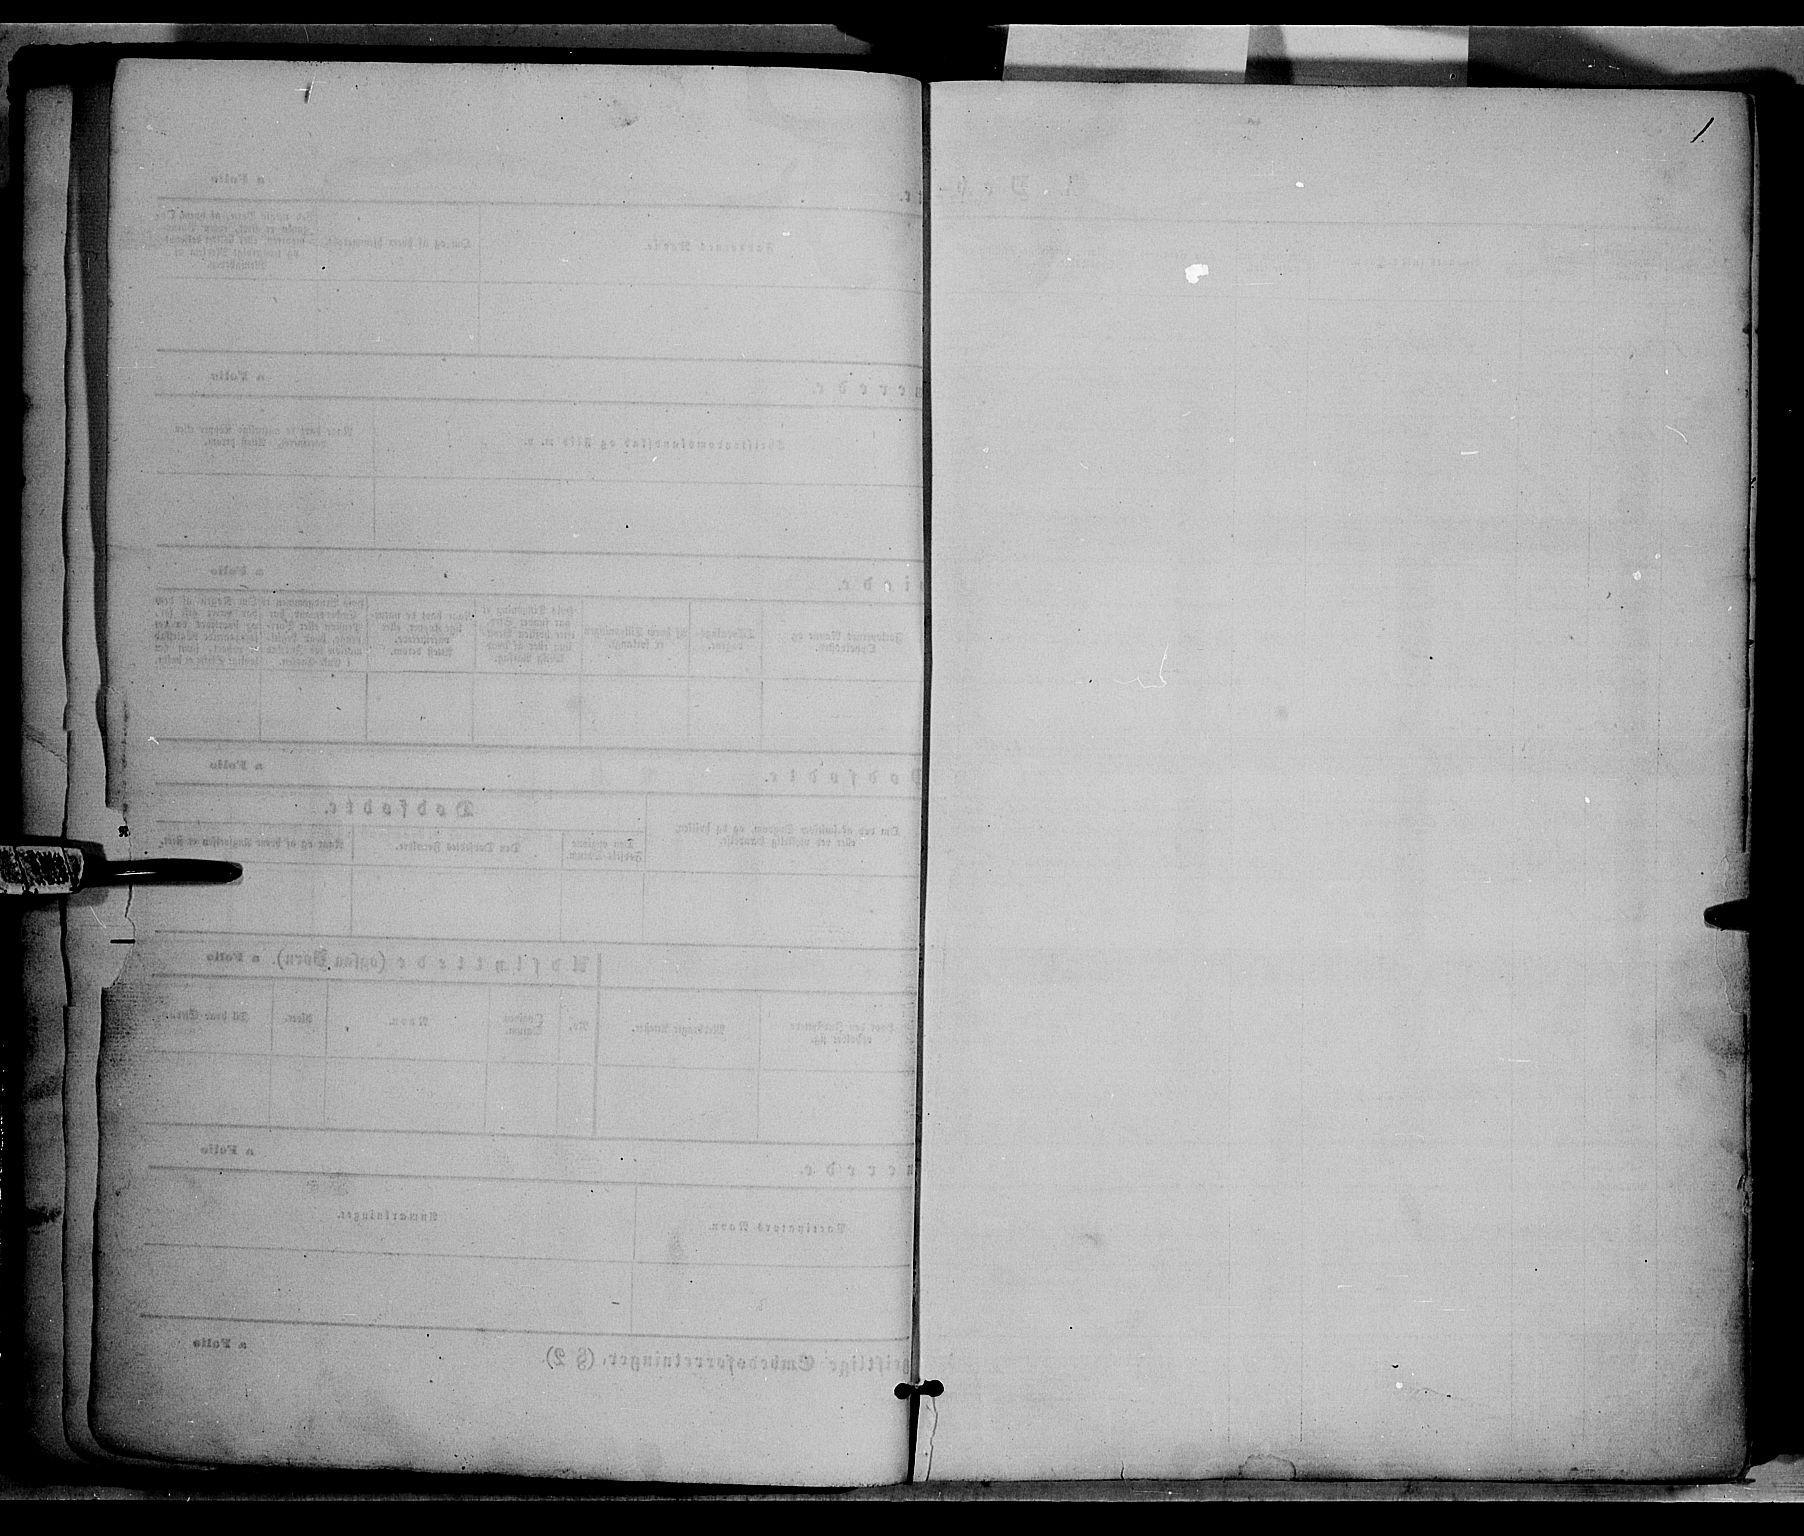 SAH, Nordre Land prestekontor, Ministerialbok nr. 1, 1860-1871, s. 1